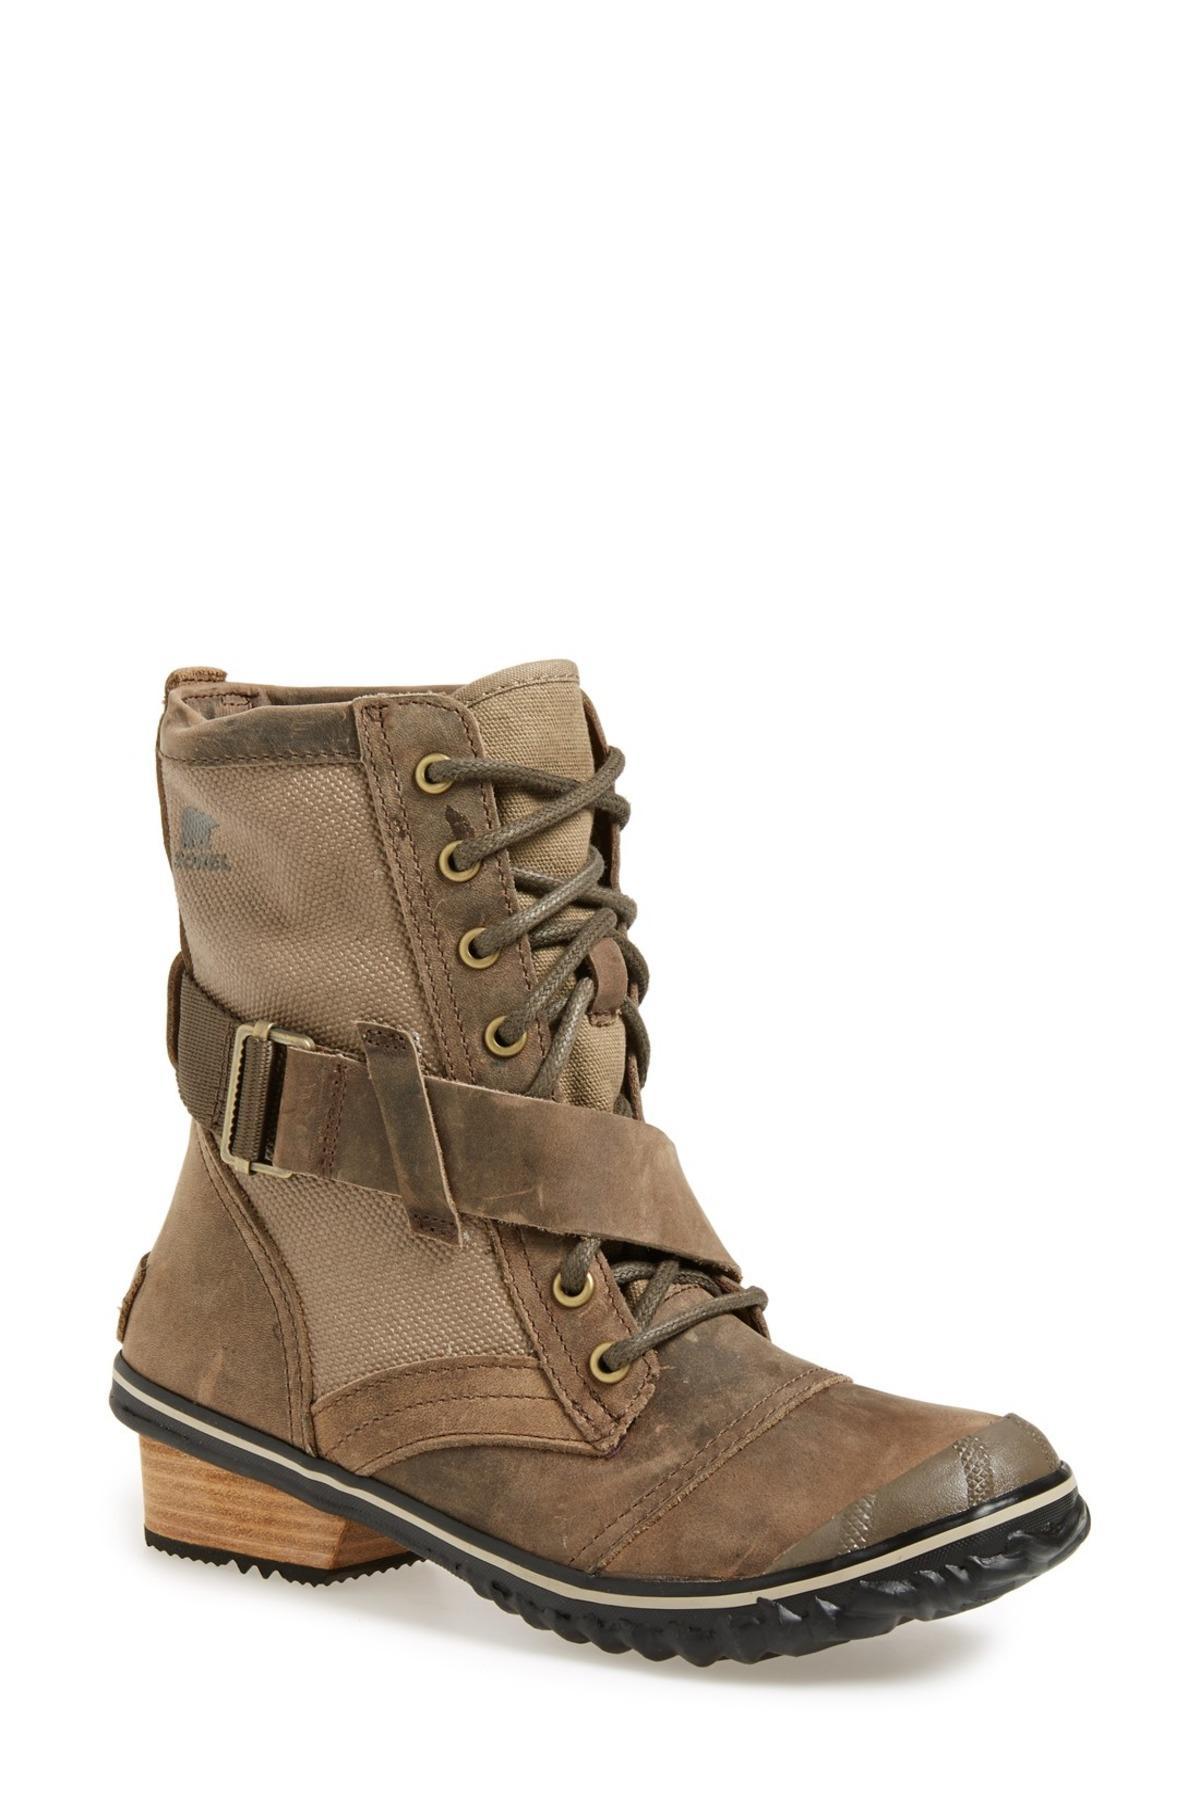 Sorel Slimboot Waterproof Lace Up Boot Women In Brown Lyst